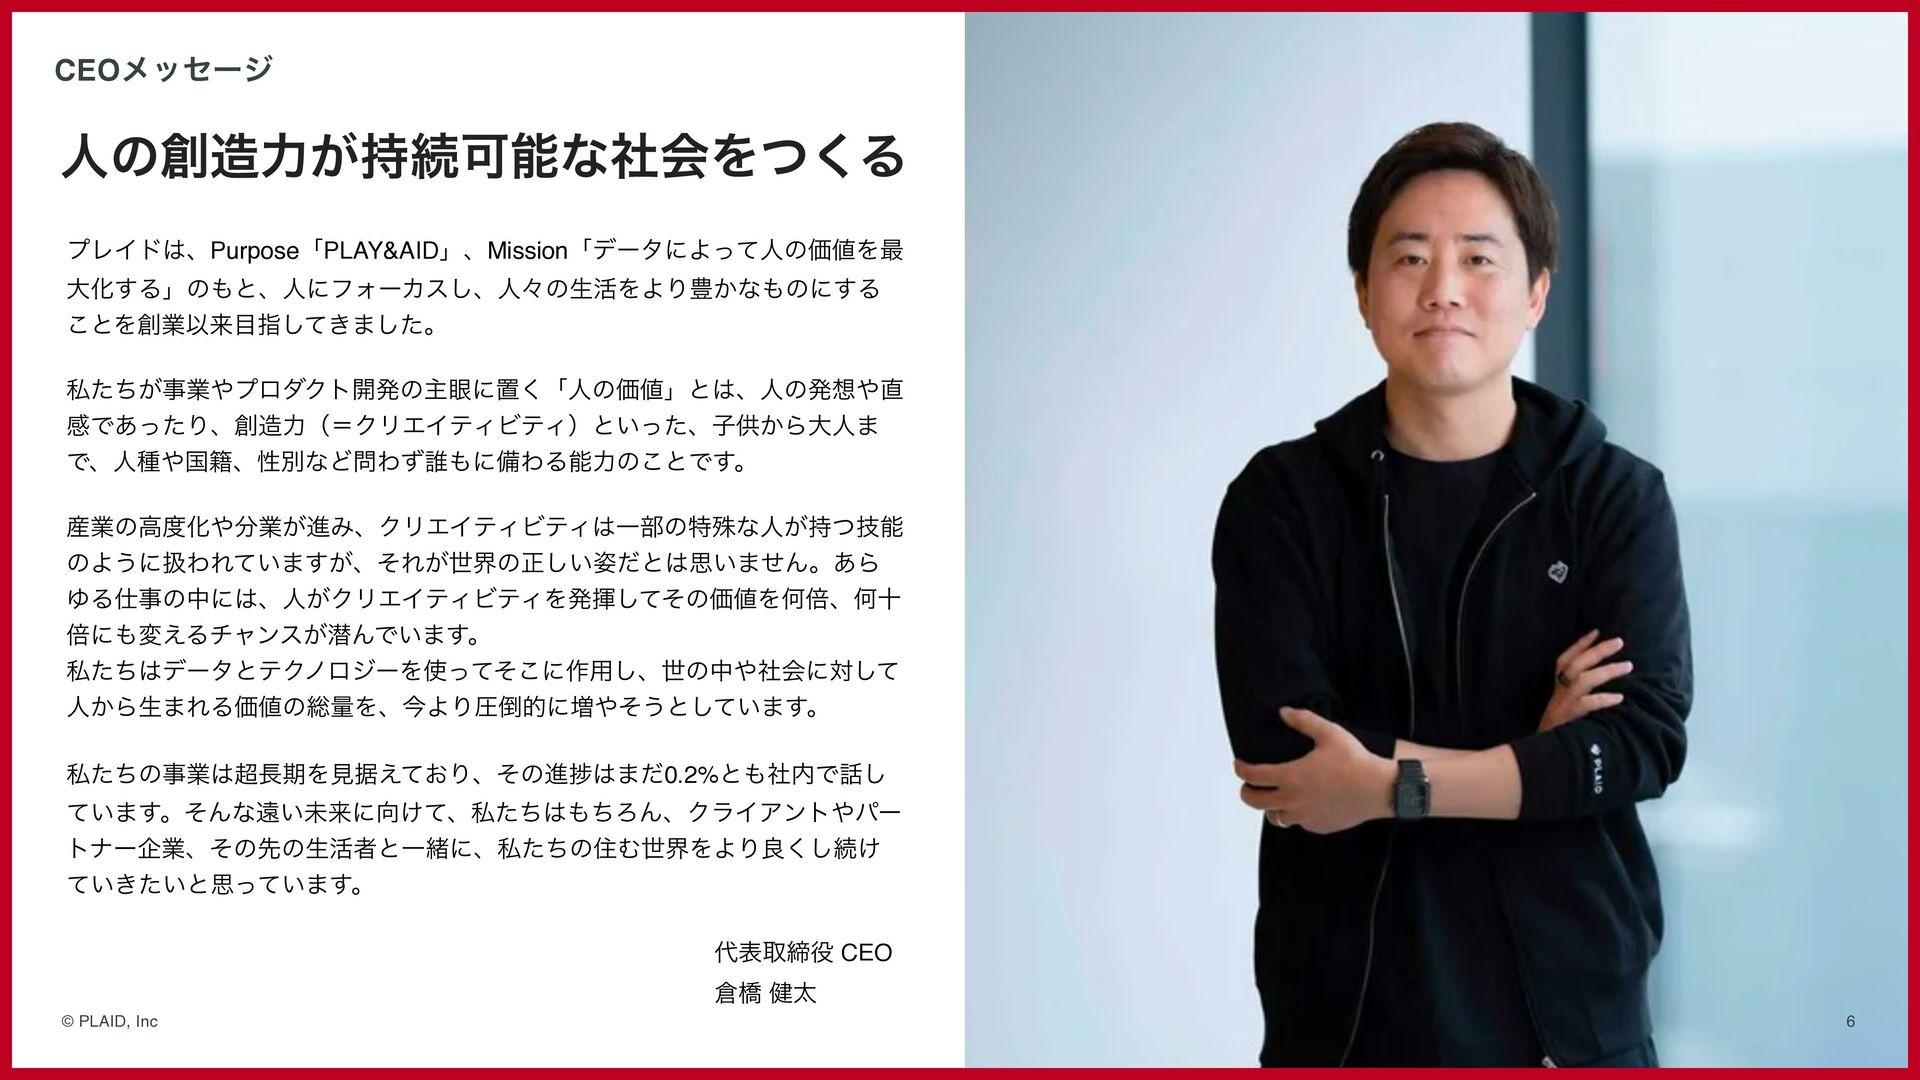 6 © PLAID, Inc Mission SECTION 2 プレイドが⽬指す世界